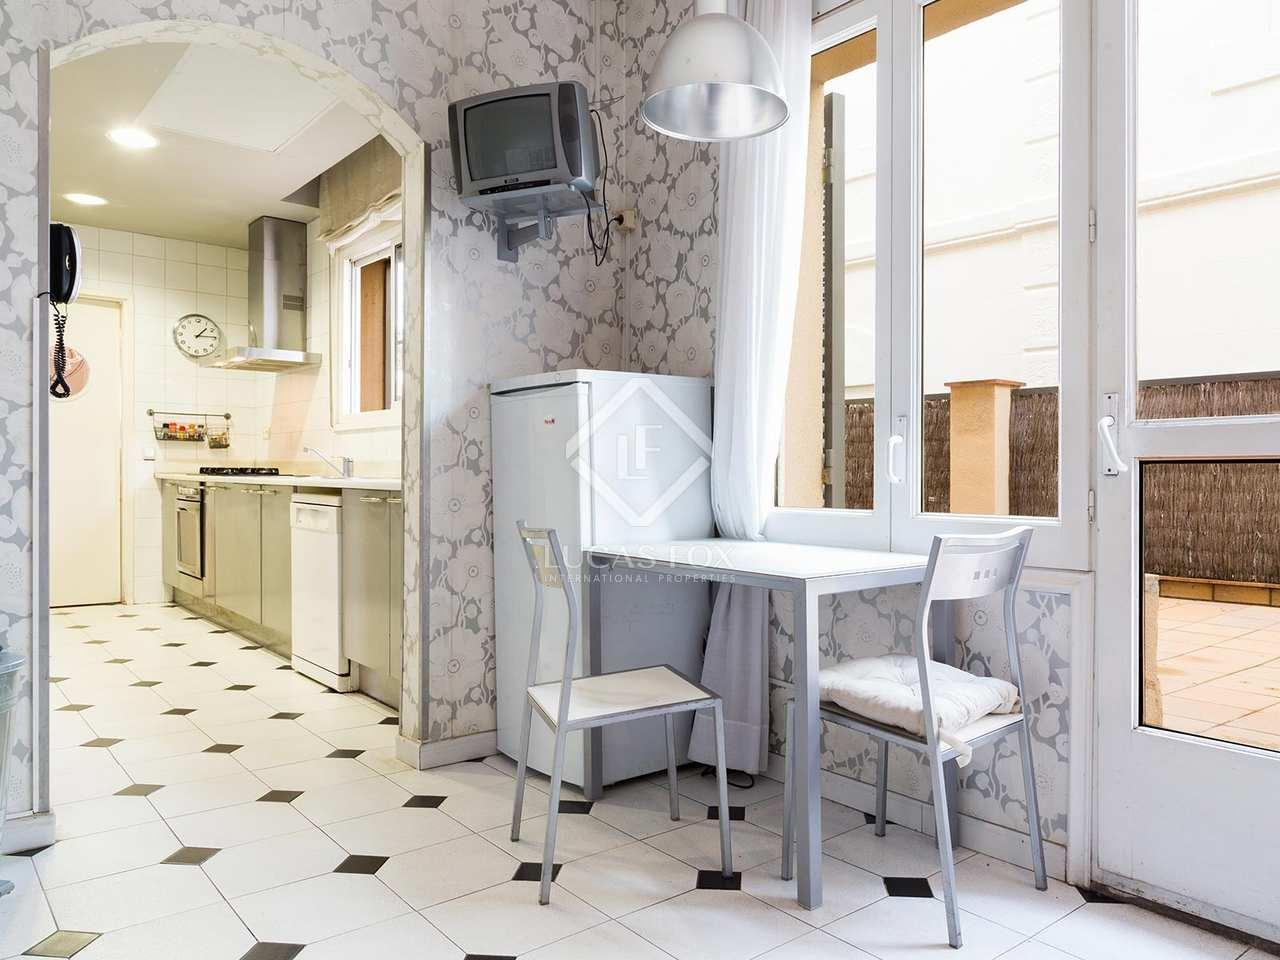 Casa en venta en la bonanova zona alta de barcelona - Zona alta barcelona ...